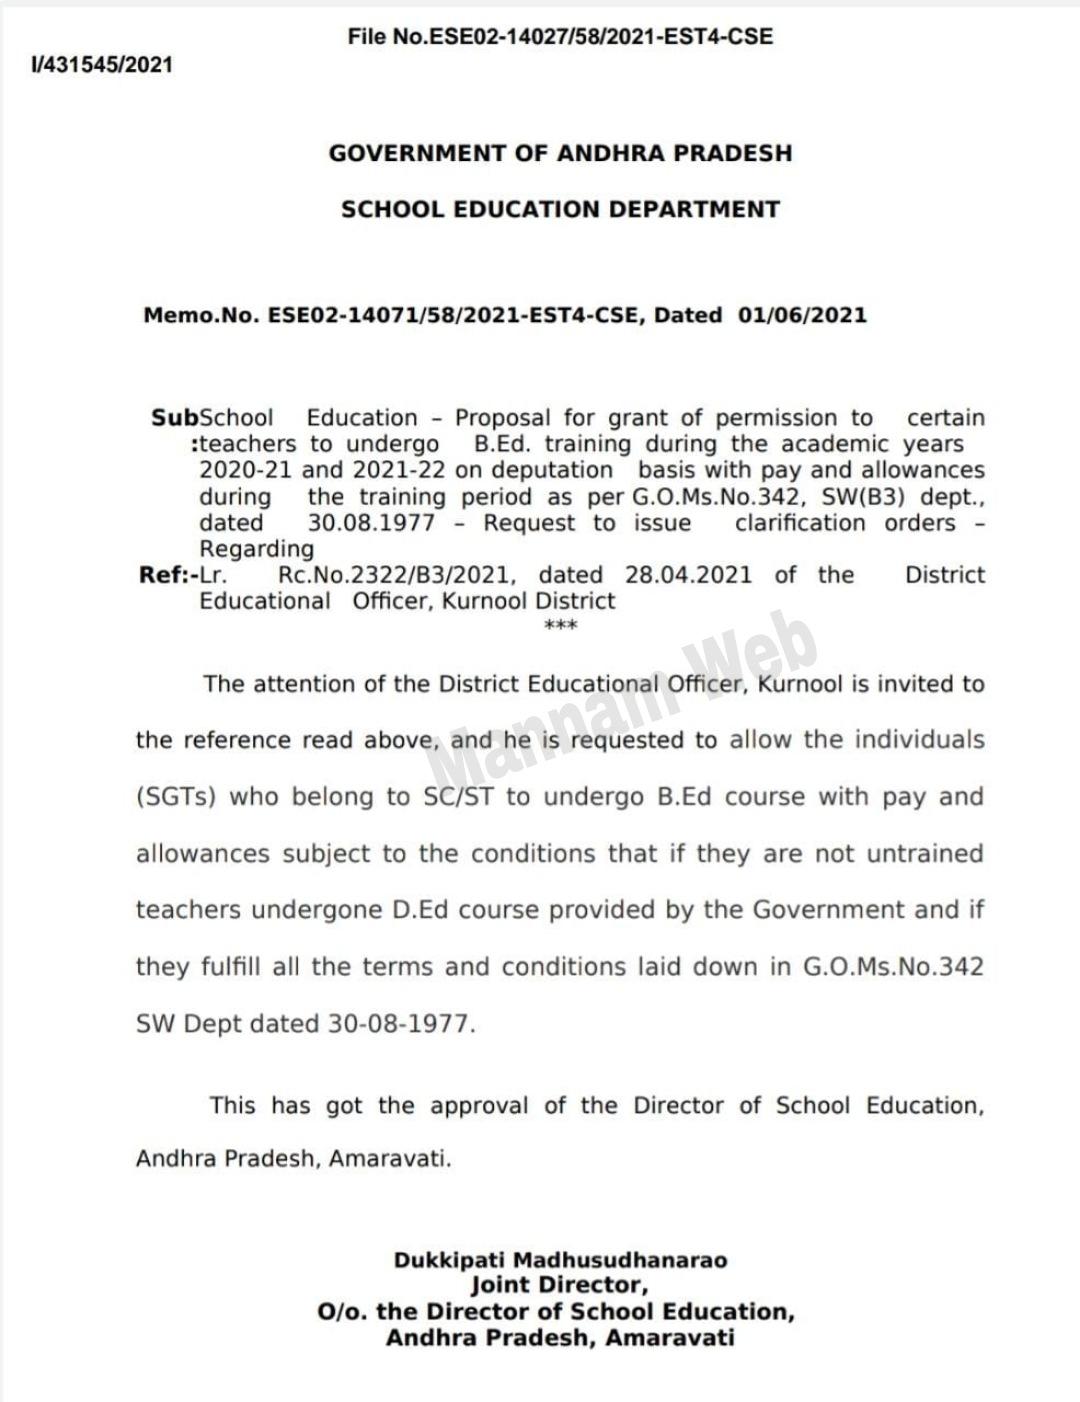 Clarification for higher education for SC, ST in-service teachers  SC,ST ఇన్ సర్వీస్ టీచర్లకు ఉన్నత విద్యాభ్యాసం చేయుటకు క్లారిఫికేషన్ జారీ: